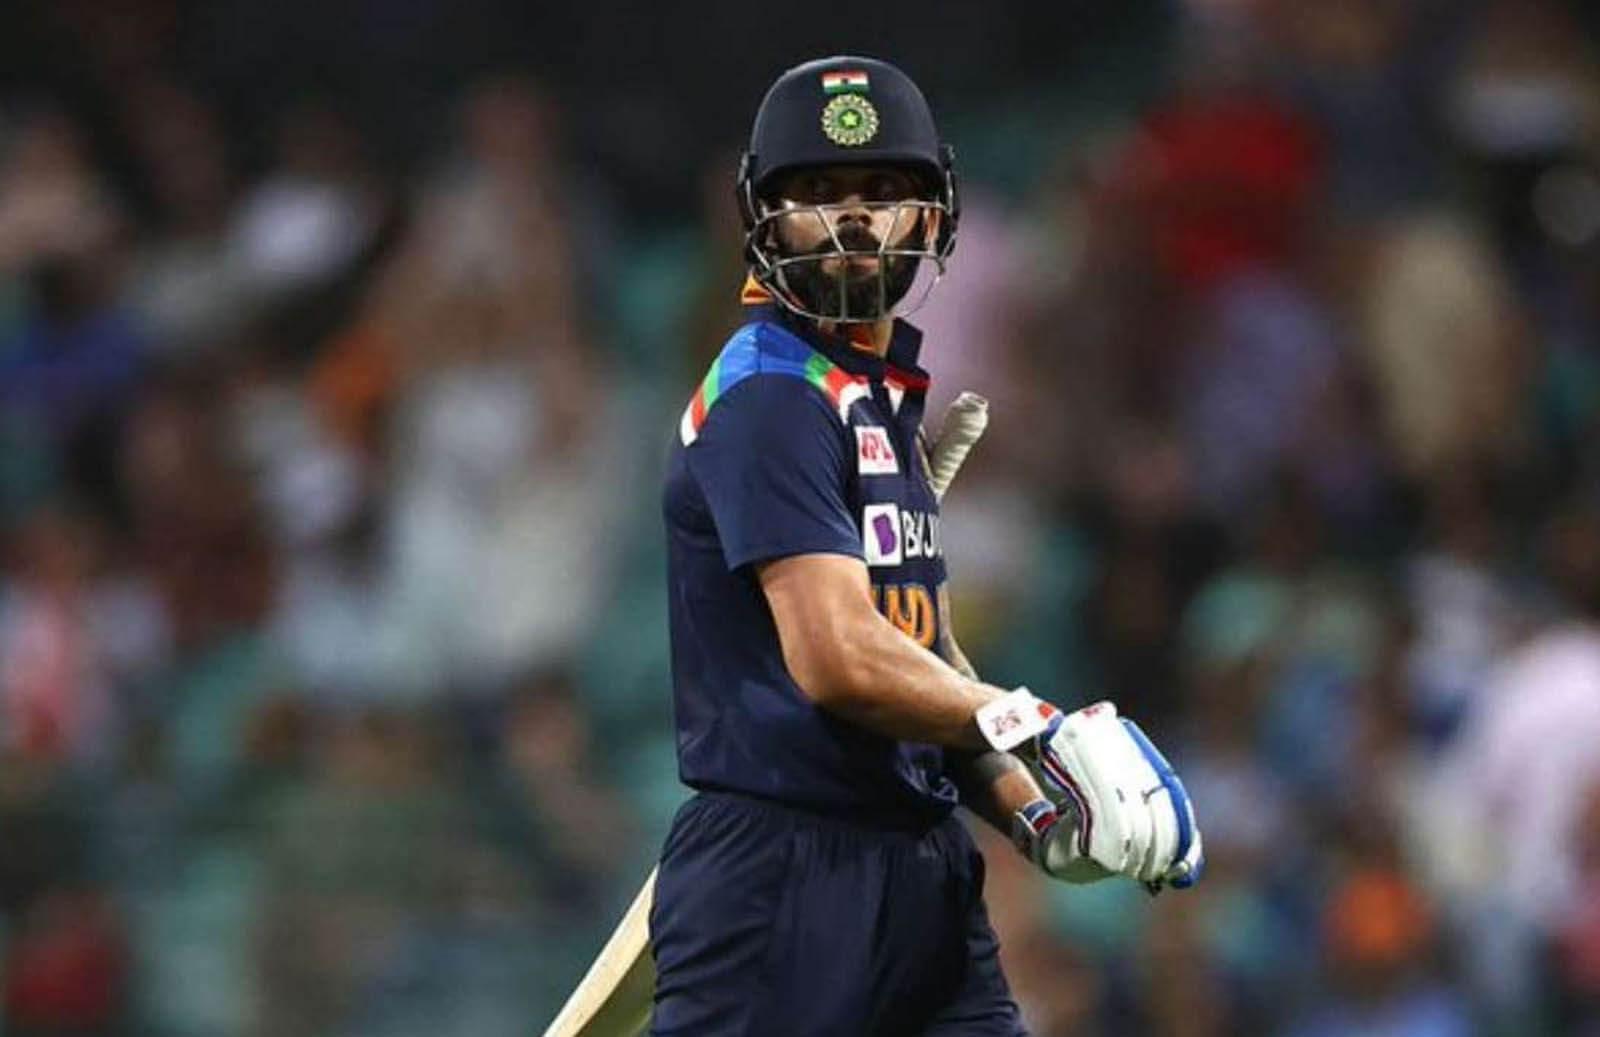 Virat Kohli Dismissed For 21 By Josh Hazlewood Against Australia in 1st ODI